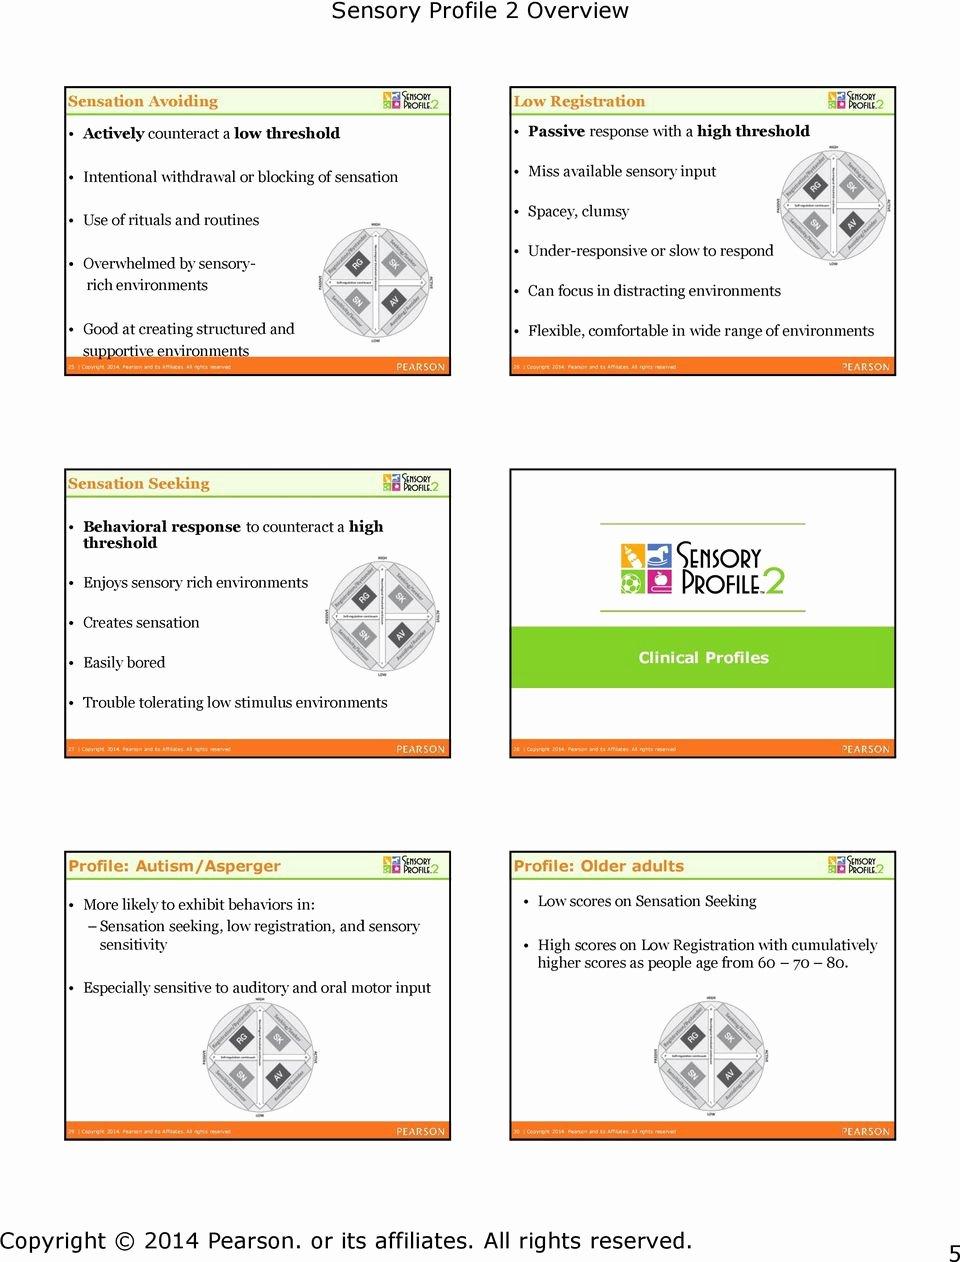 Sat Pearson Flexible Scoring New Sensory Profile 2 Overview Pdf